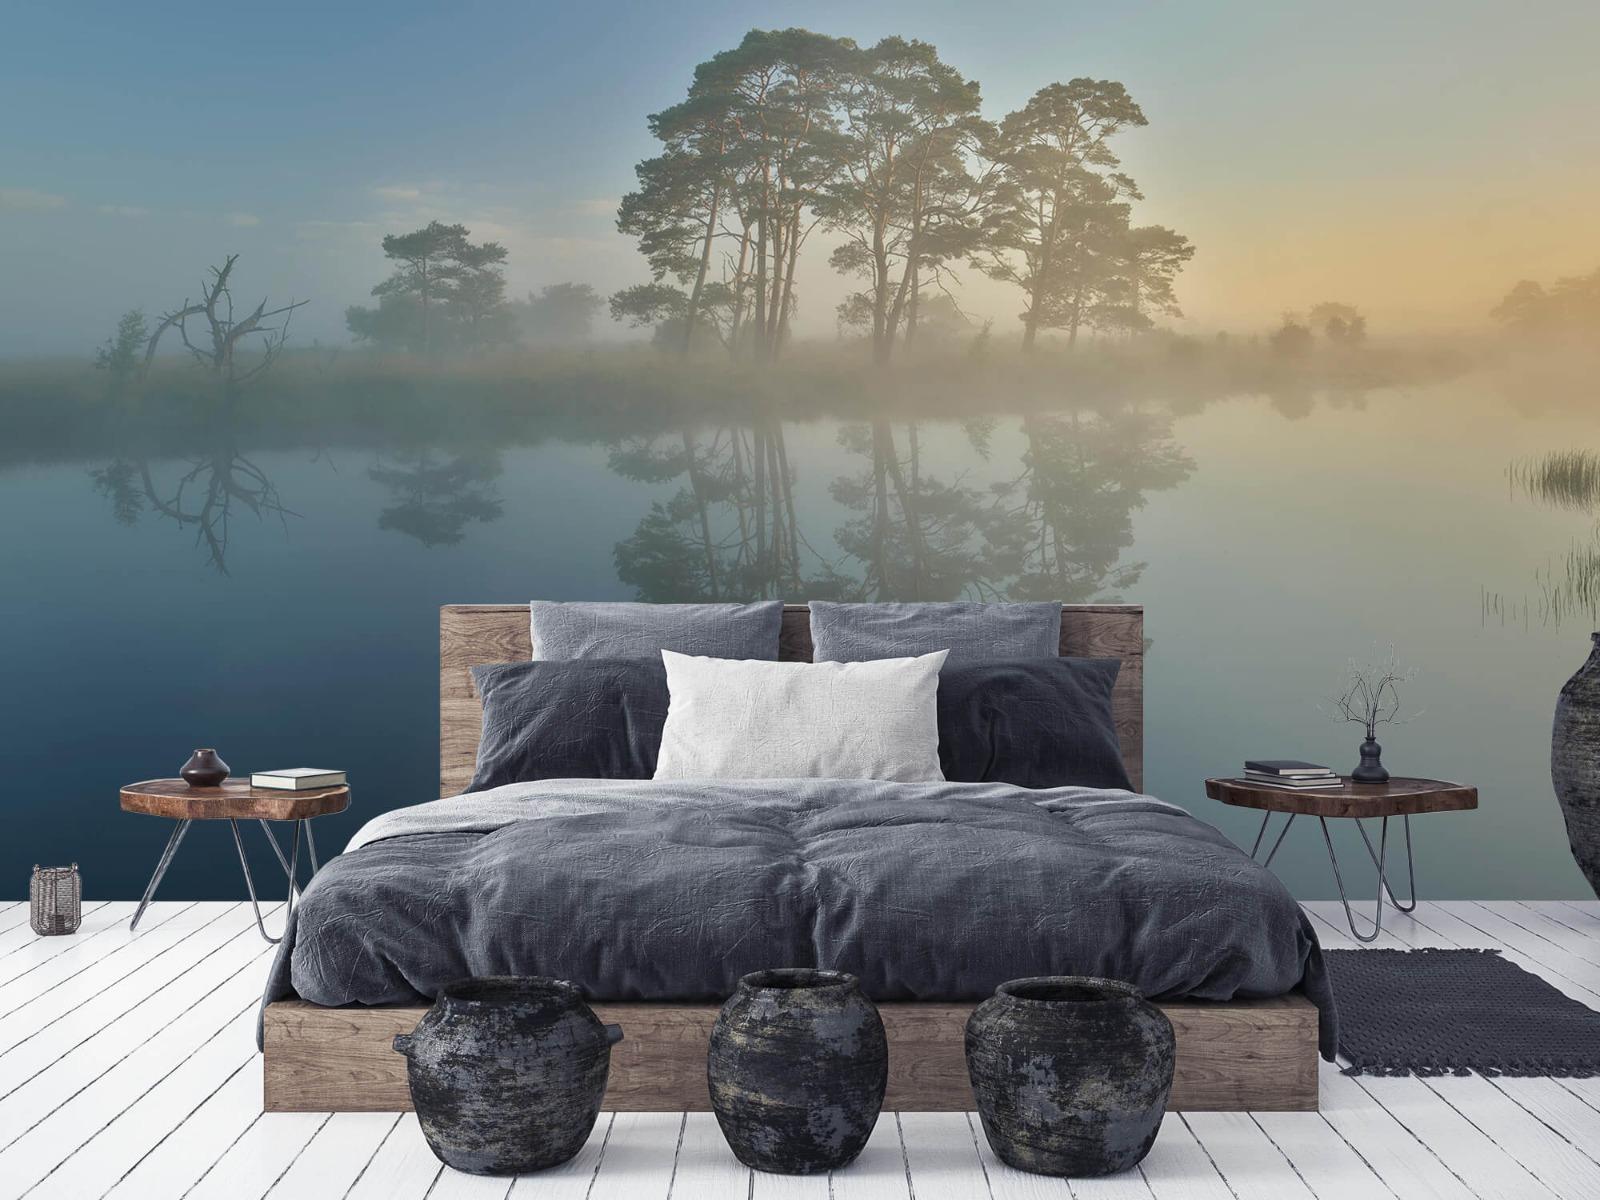 Natuur - Mist in heidegebied 8